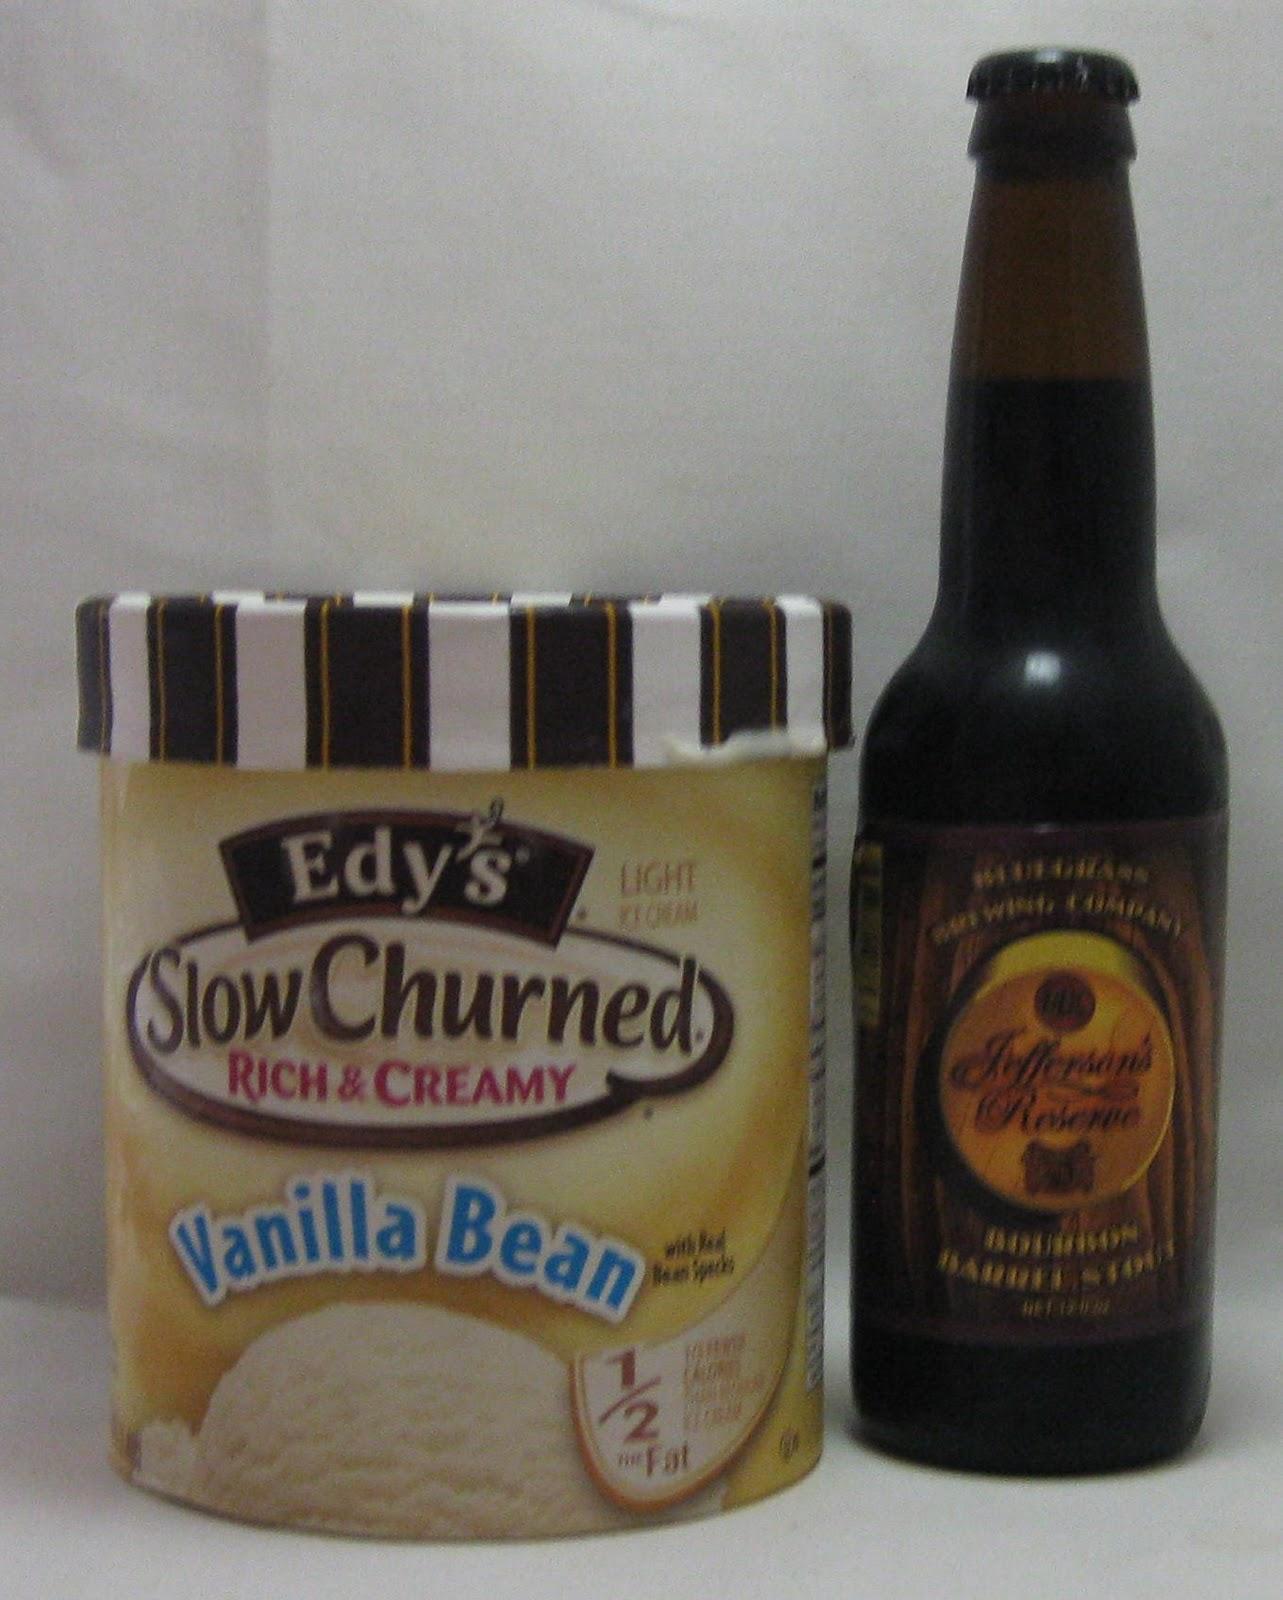 Beer + Ice Cream = Beer Cream | Very Small Beer